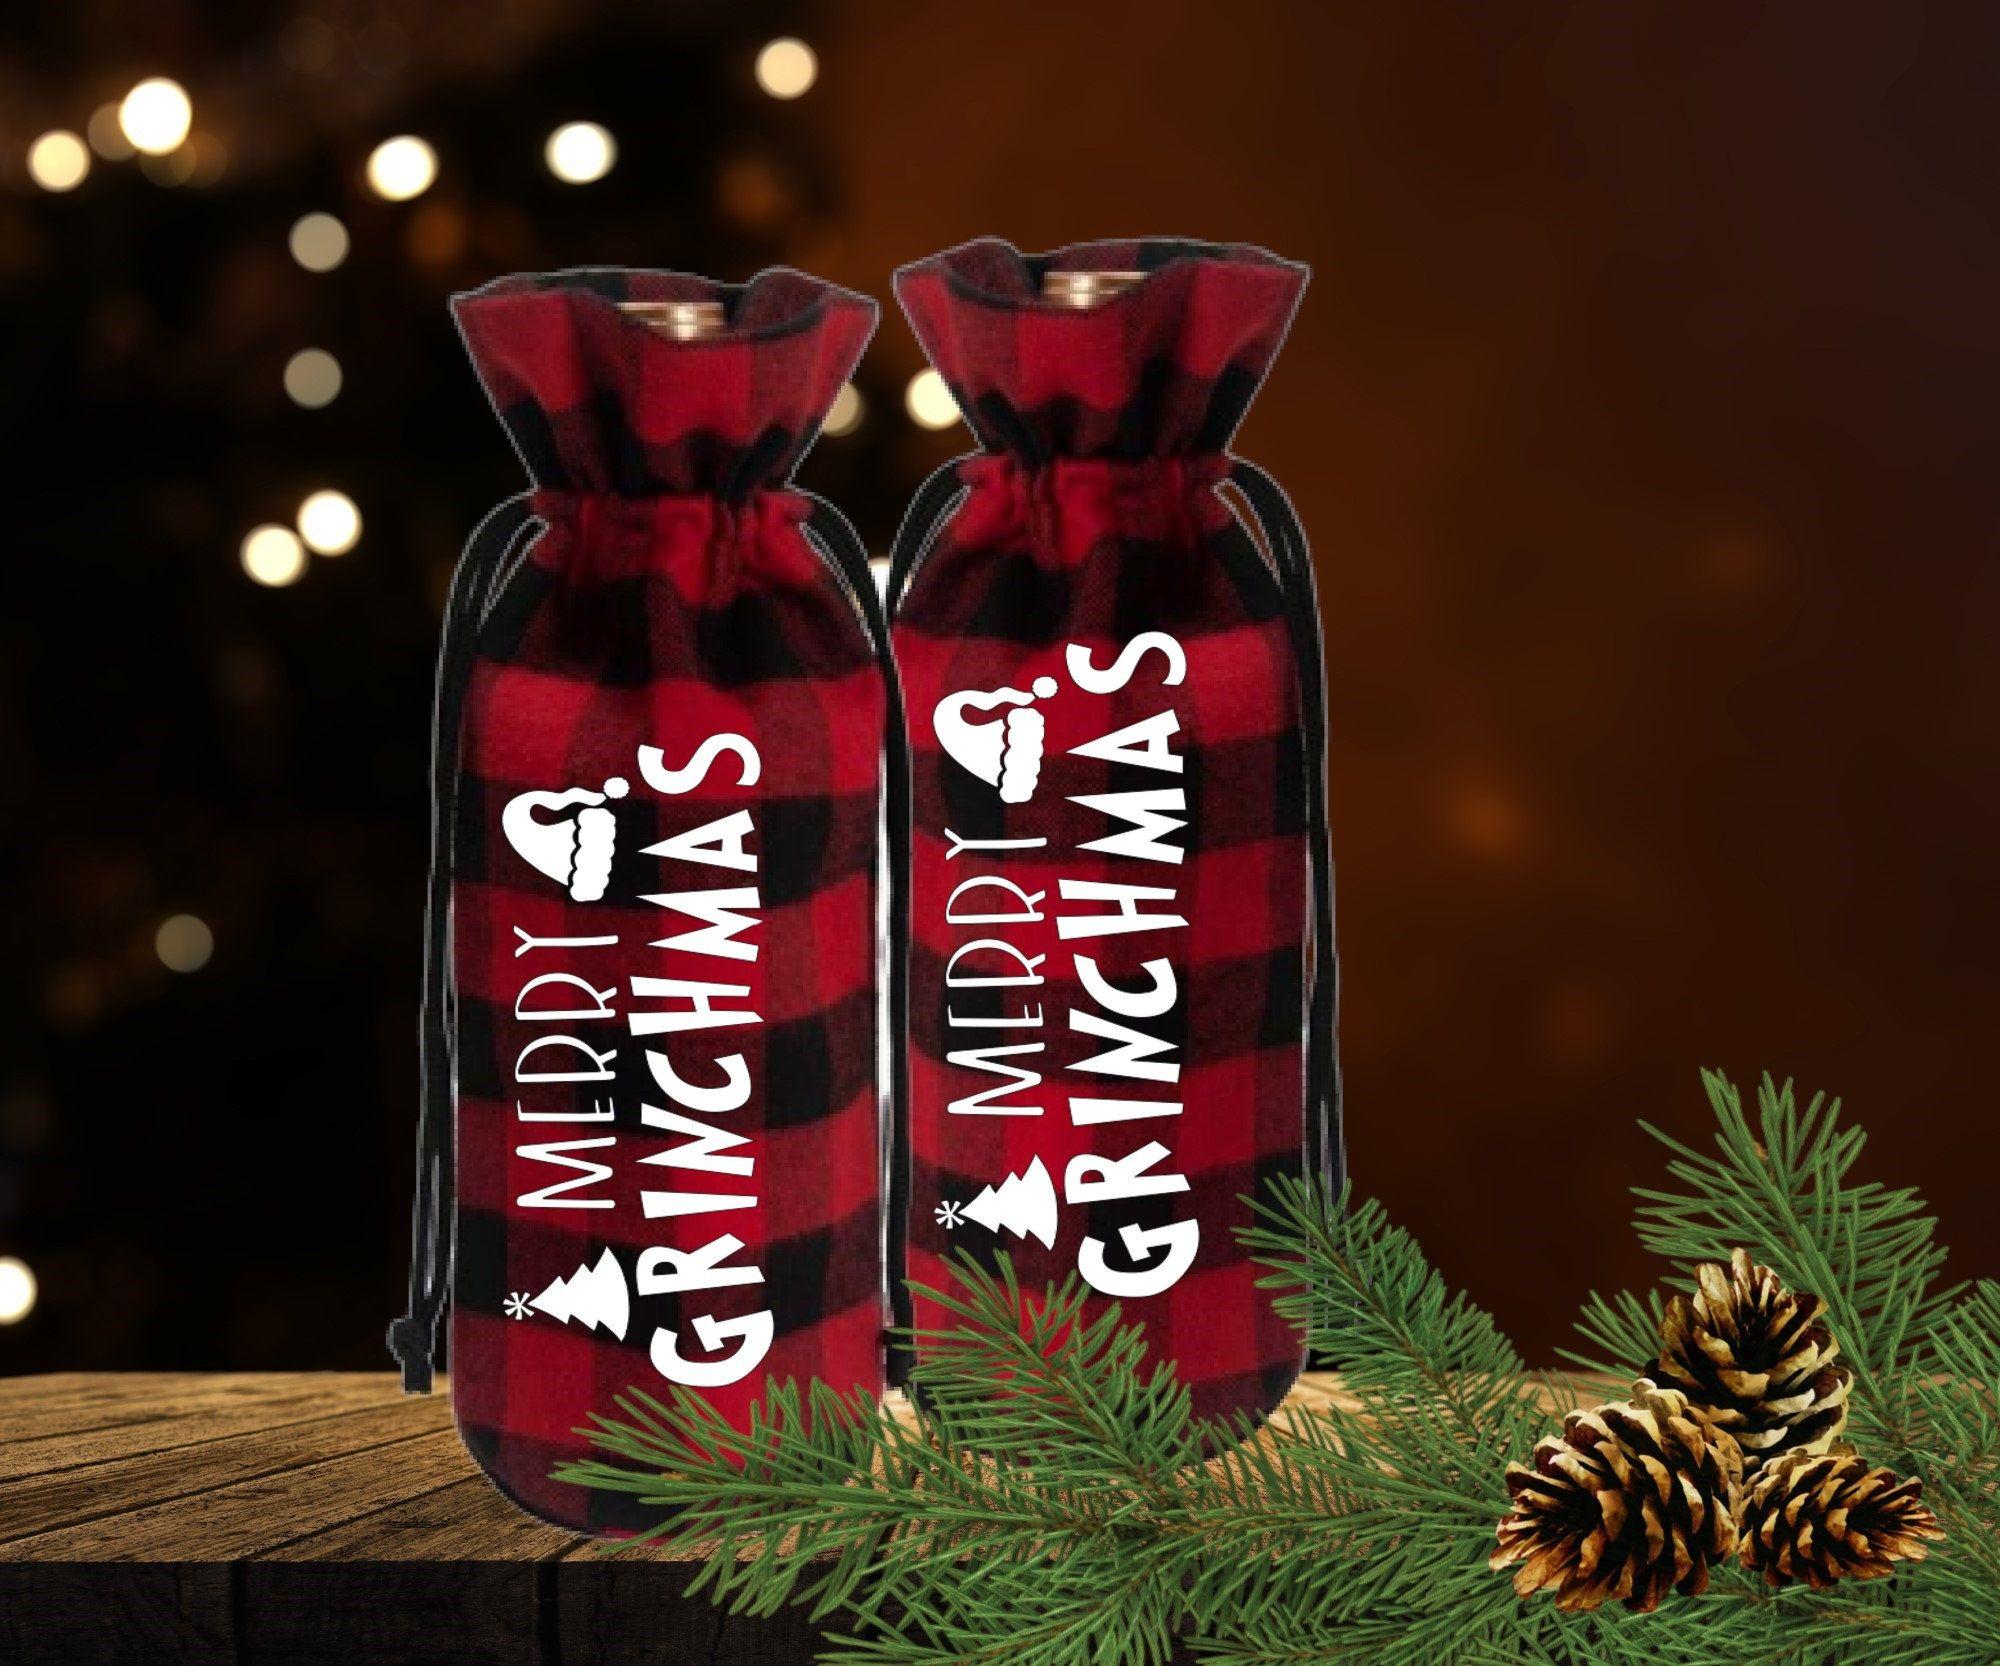 Merry Grinchmas Wine Bag Wine Gift Bag Buffalo Plaid Wine Etsy Wine Bag Wine Gift Bag Gifts